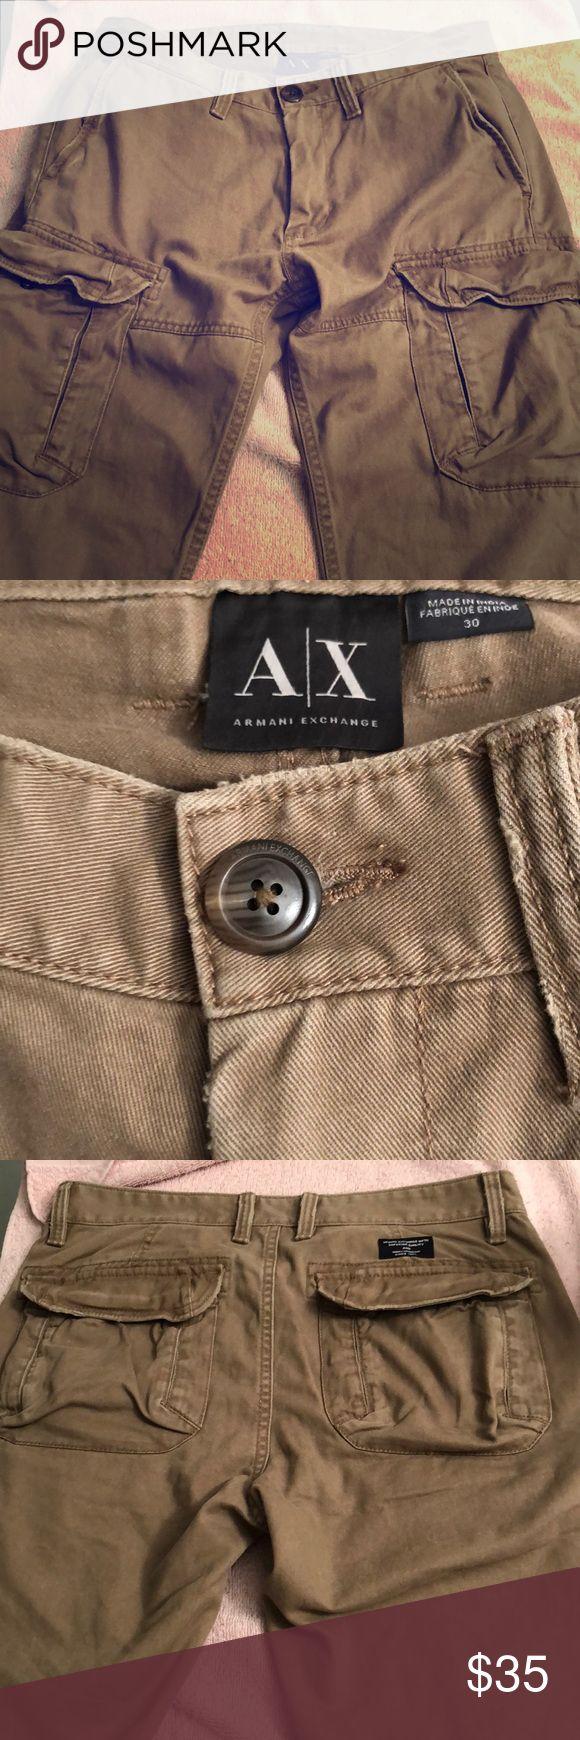 Men's dark beige cargo pants by Armani Exchange Gently worn dark beige Armani Exchange cargo pants. Size 30.  Great condition Armani Exchange Pants Cargo